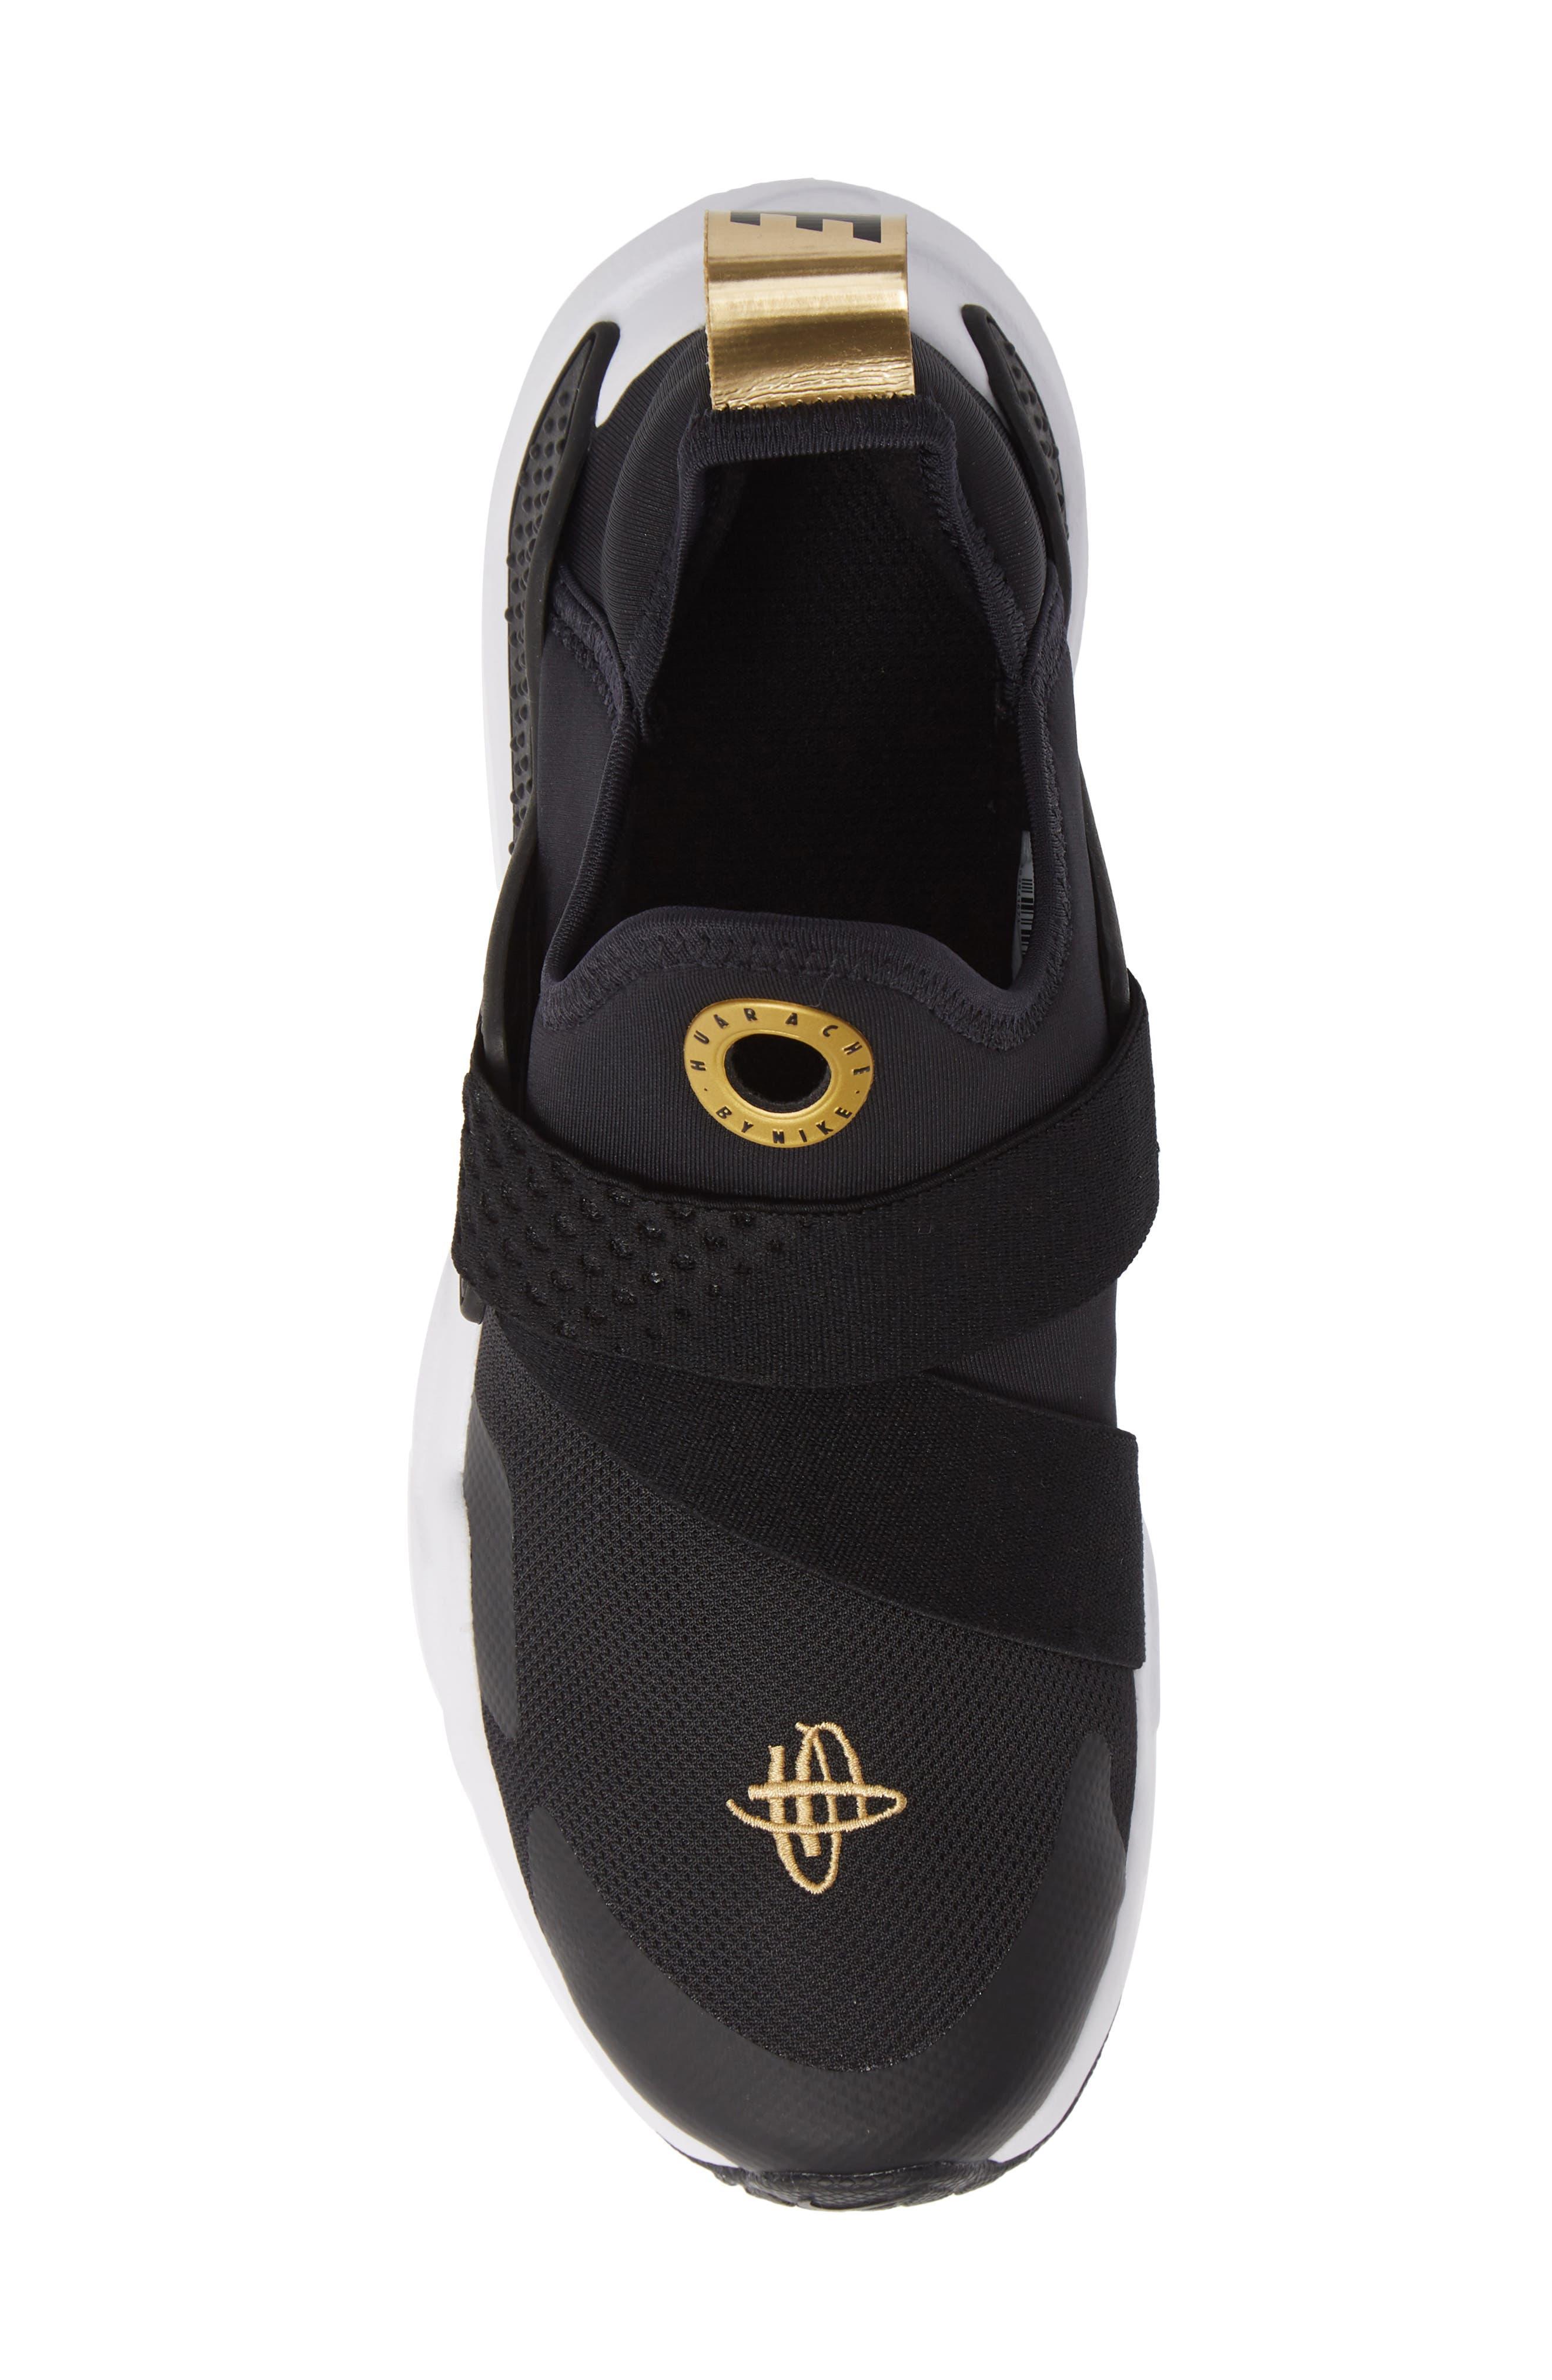 Huarache Extreme Sneaker,                             Alternate thumbnail 5, color,                             BLACK/ METALLIC GOLD/ WHITE